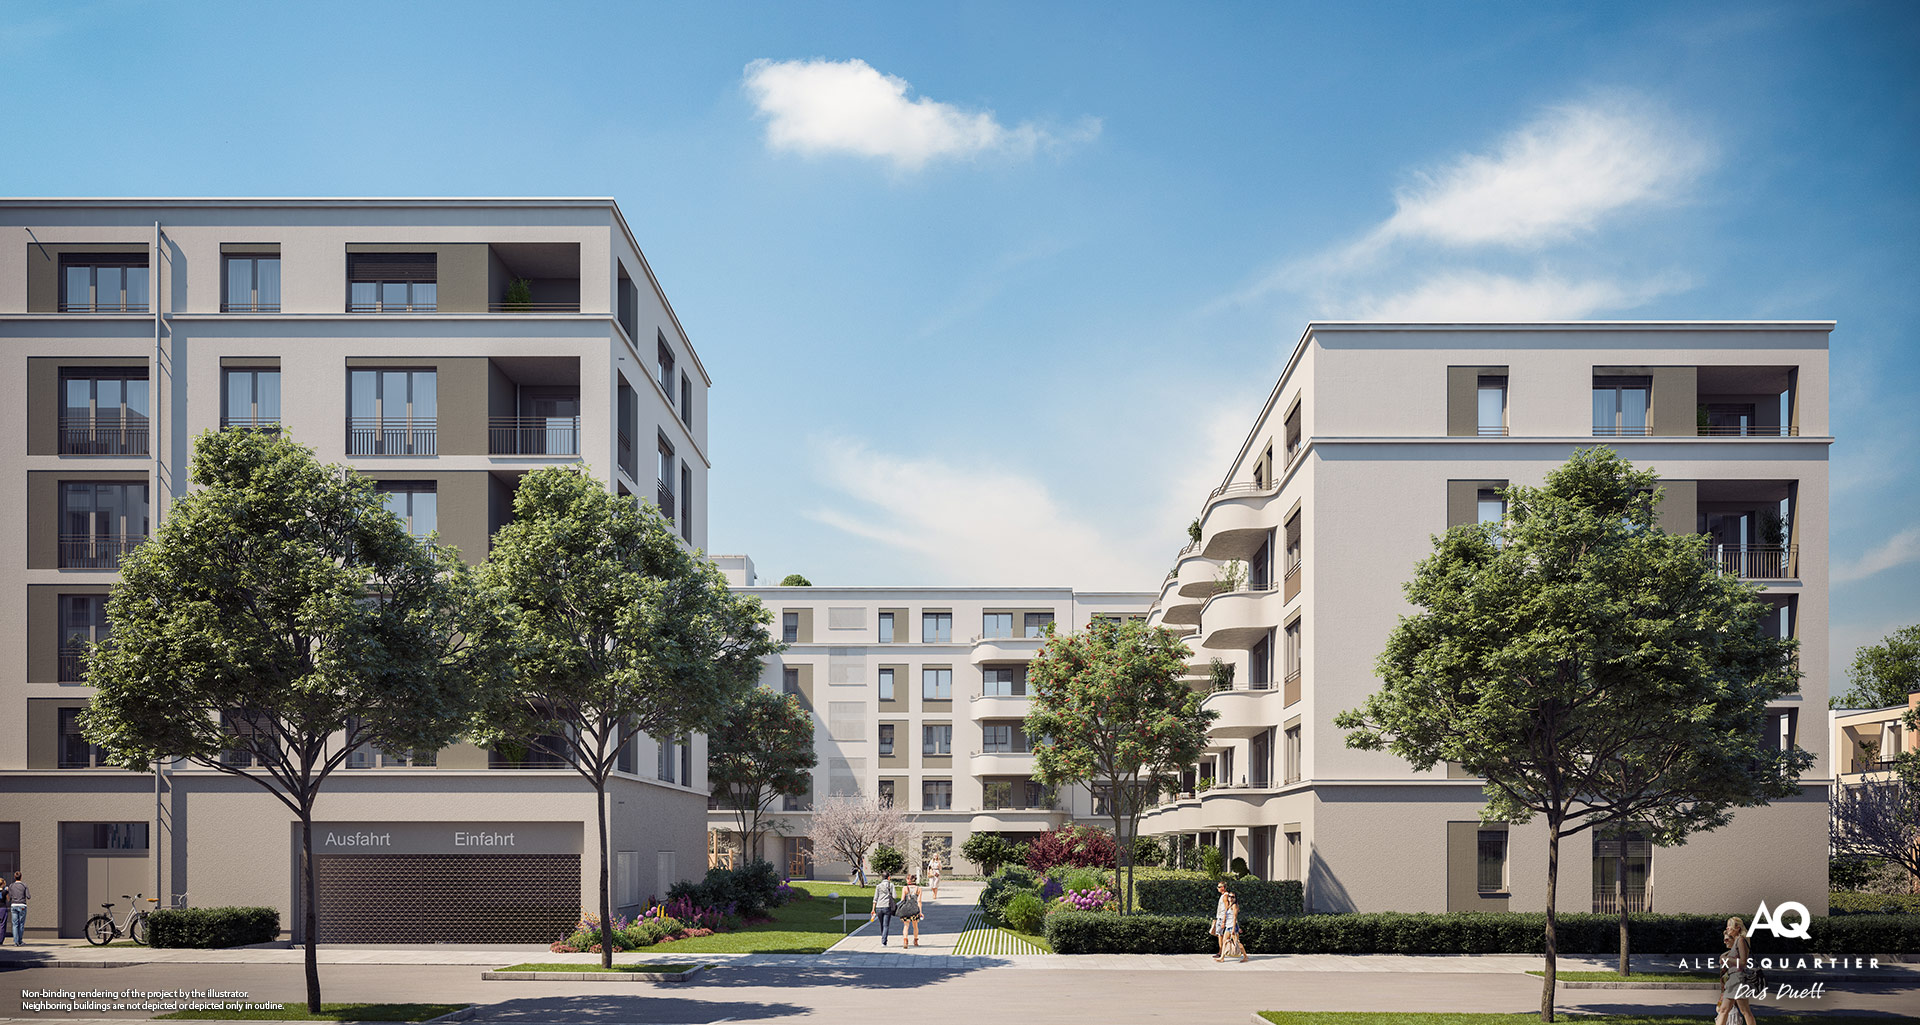 Condominiums Munich: Slider - Das Duett